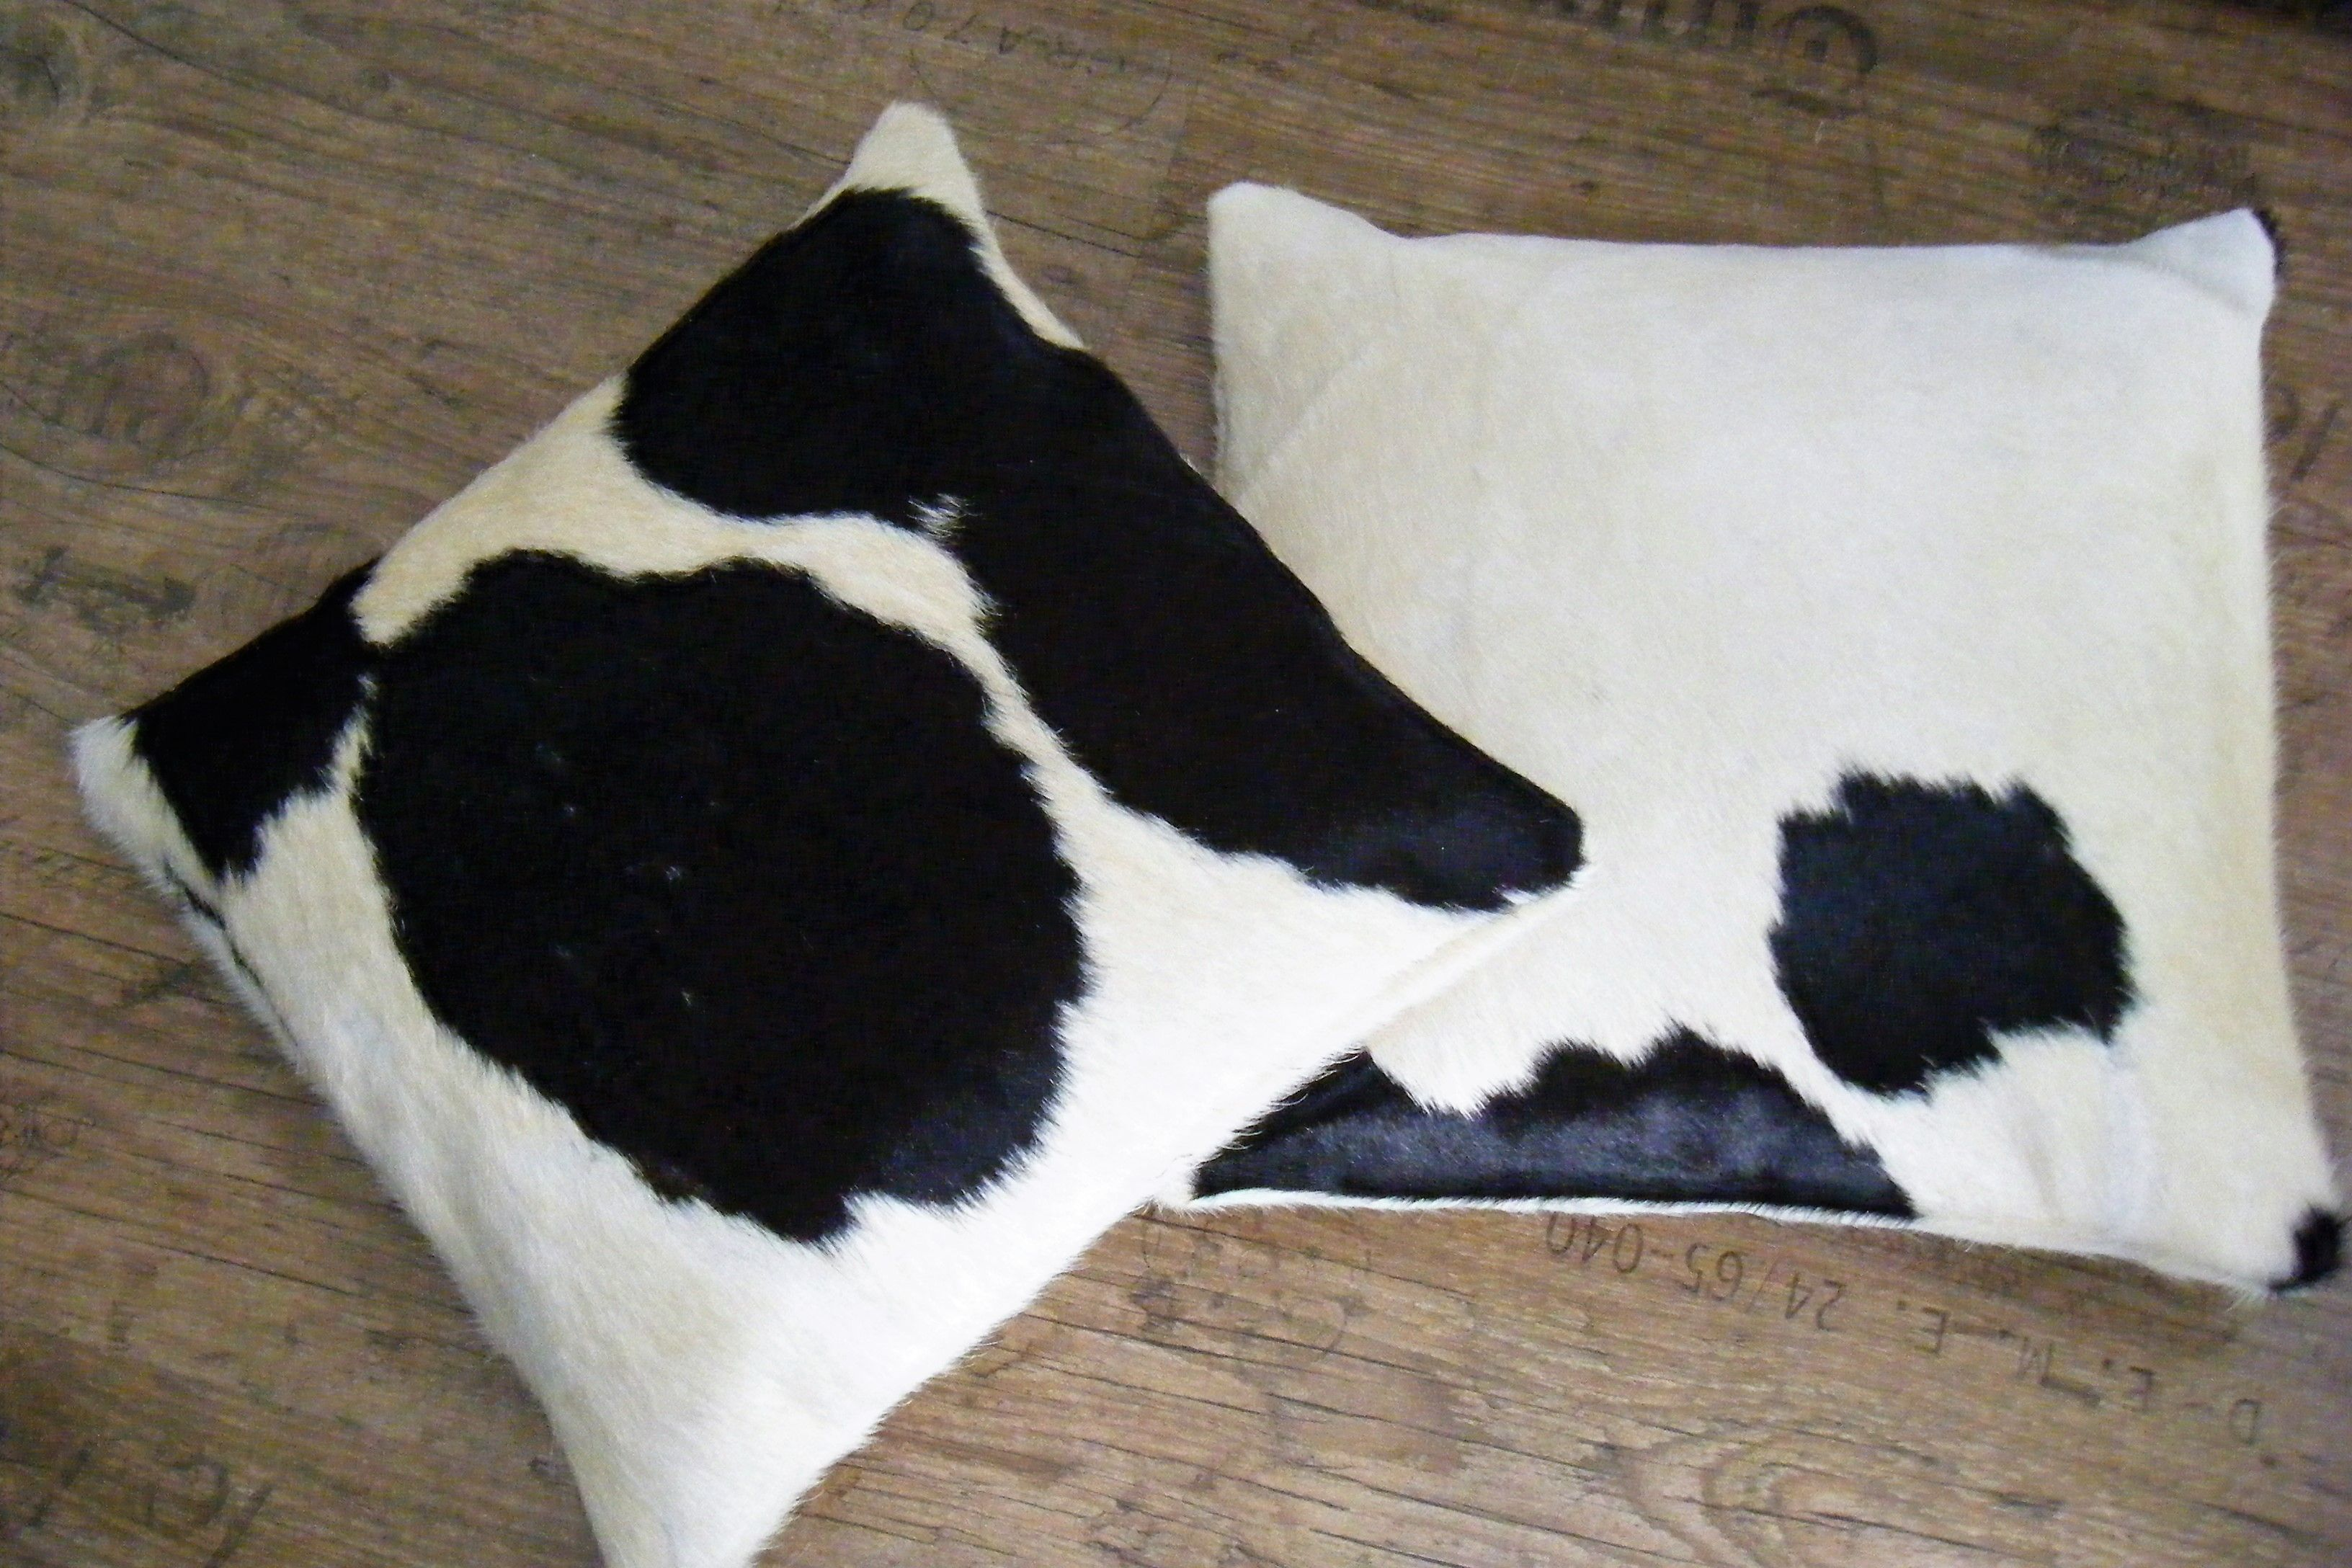 Kussens van koeienhuid kussen koeienhuid rood wit zwart